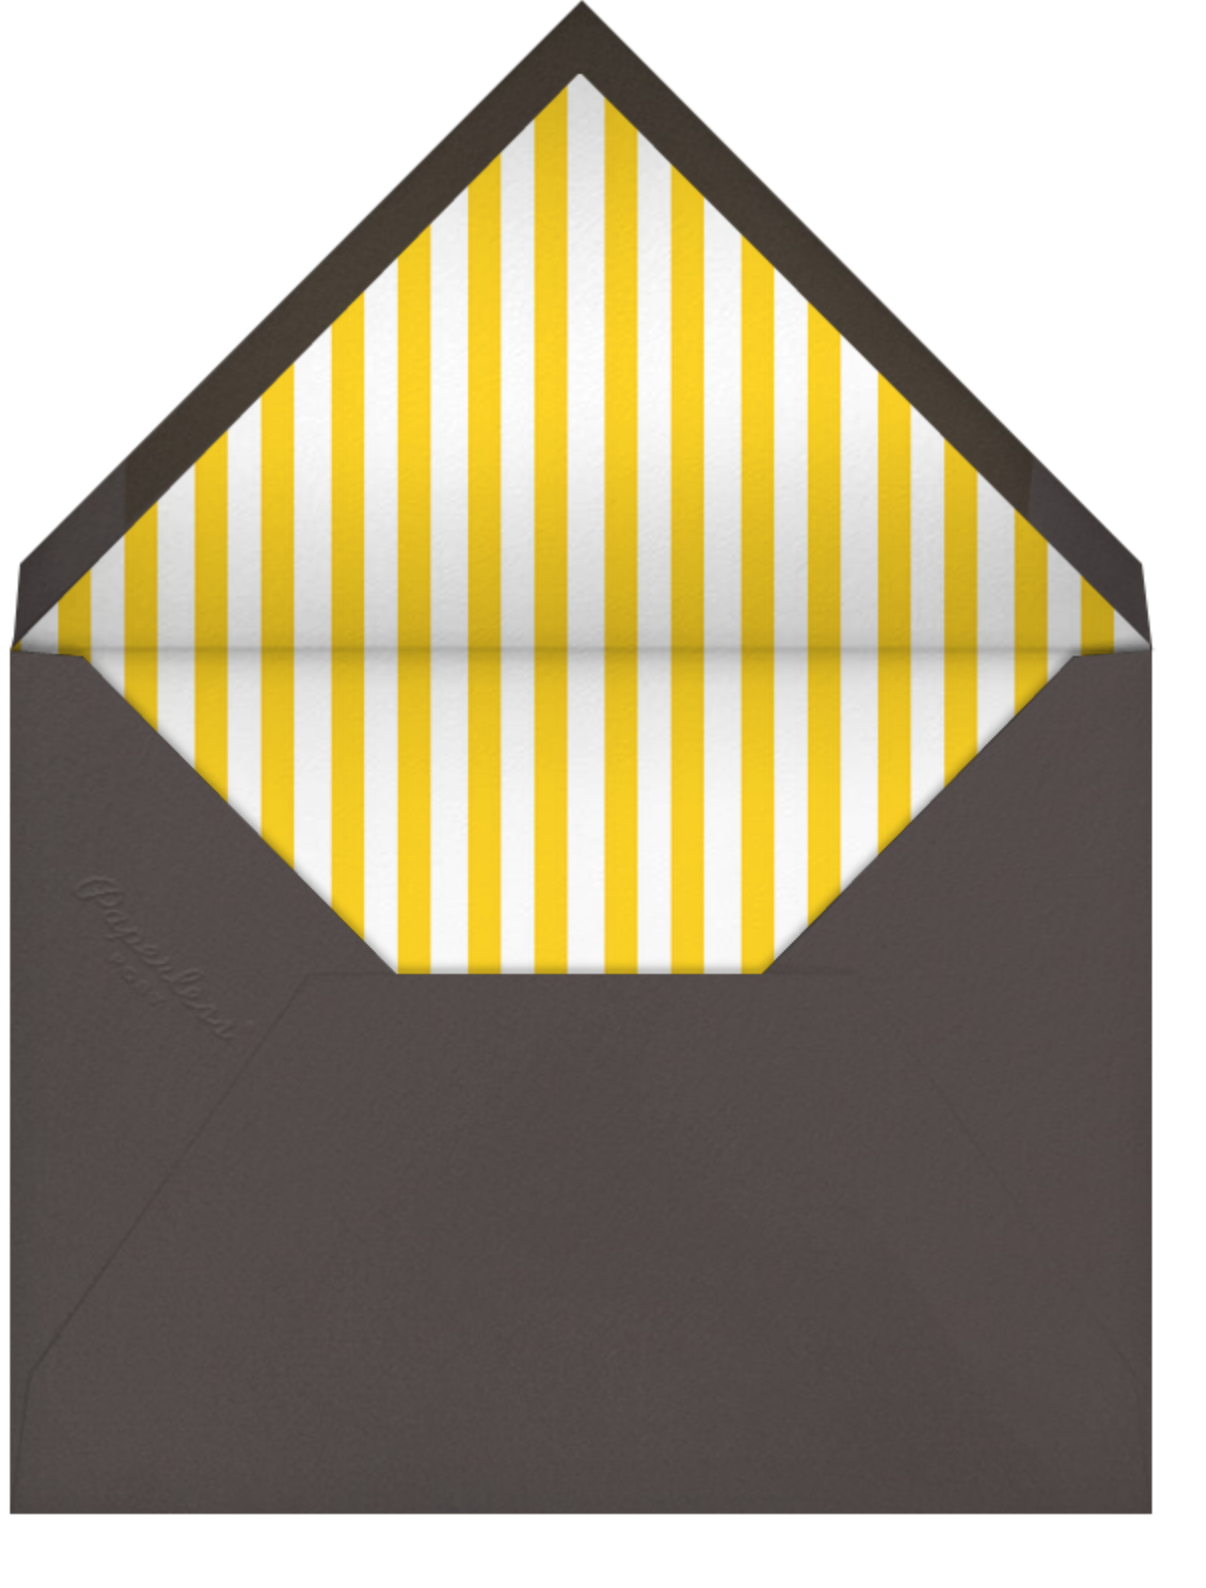 Nixon - Clay - Jonathan Adler - Reception - envelope back